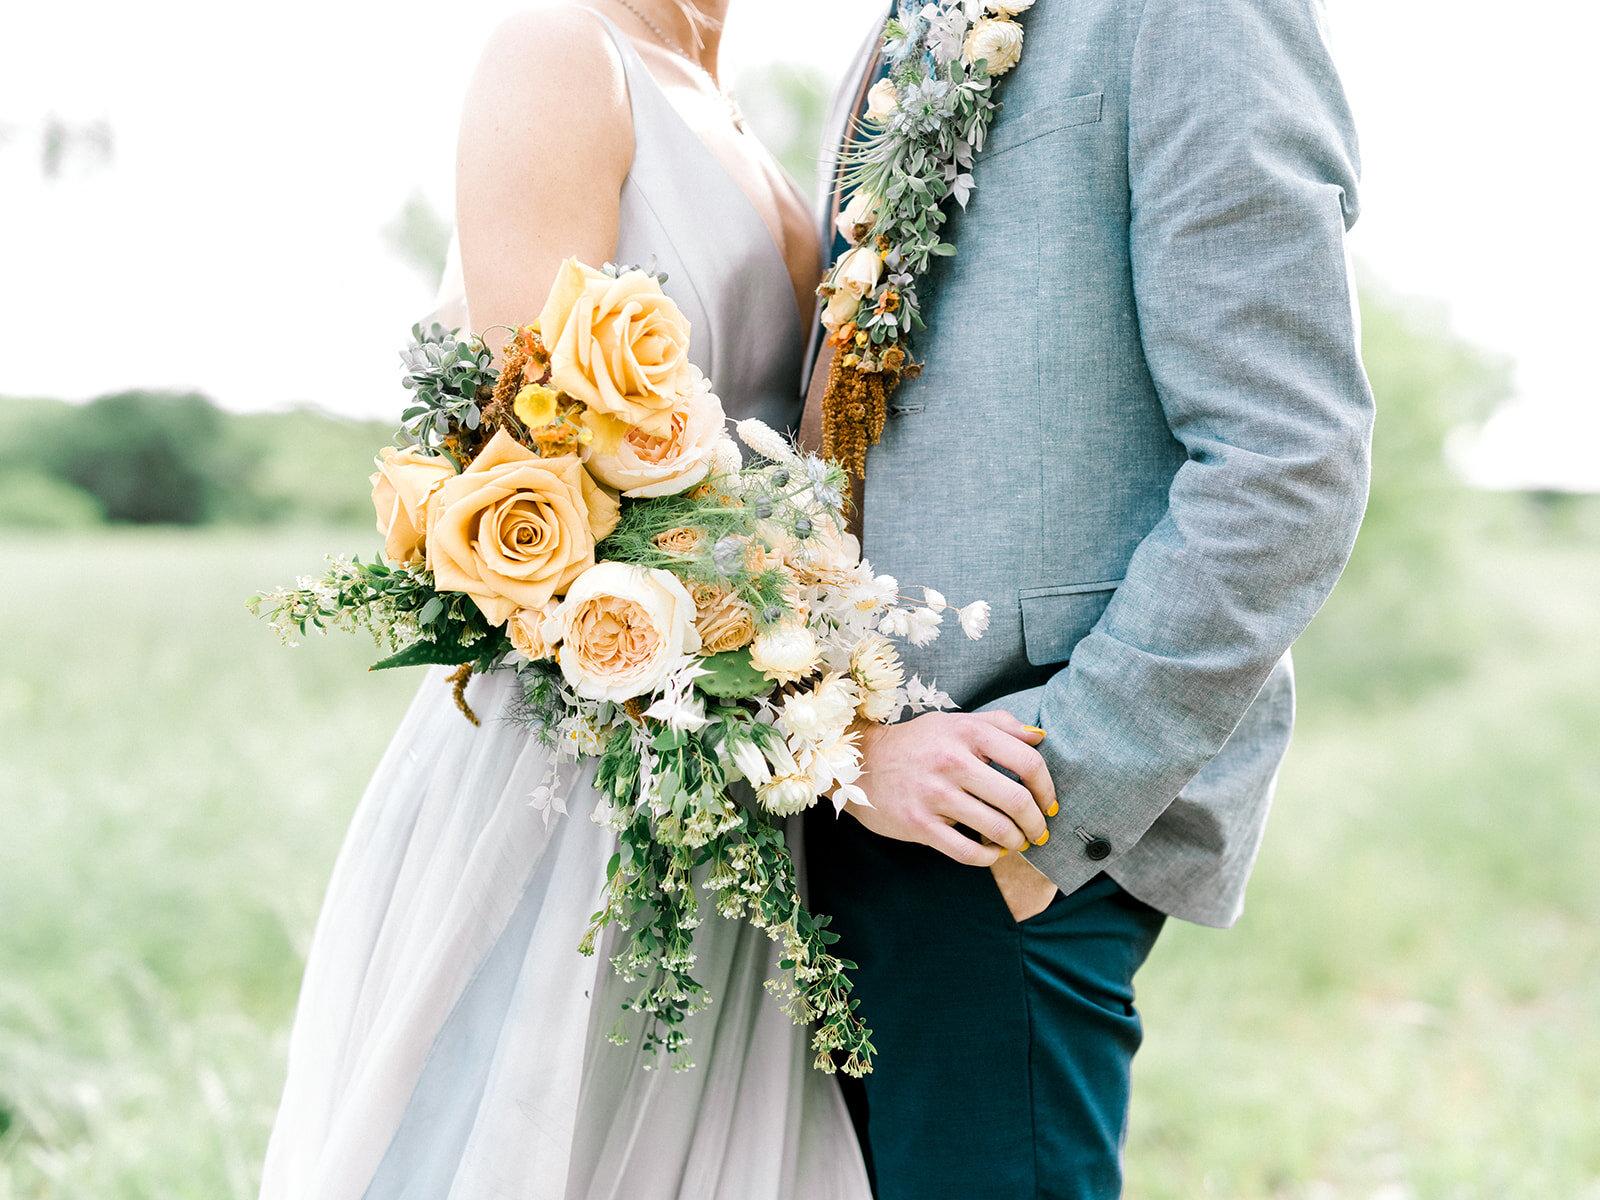 Yellow Rose of Texas Wedding Flowers